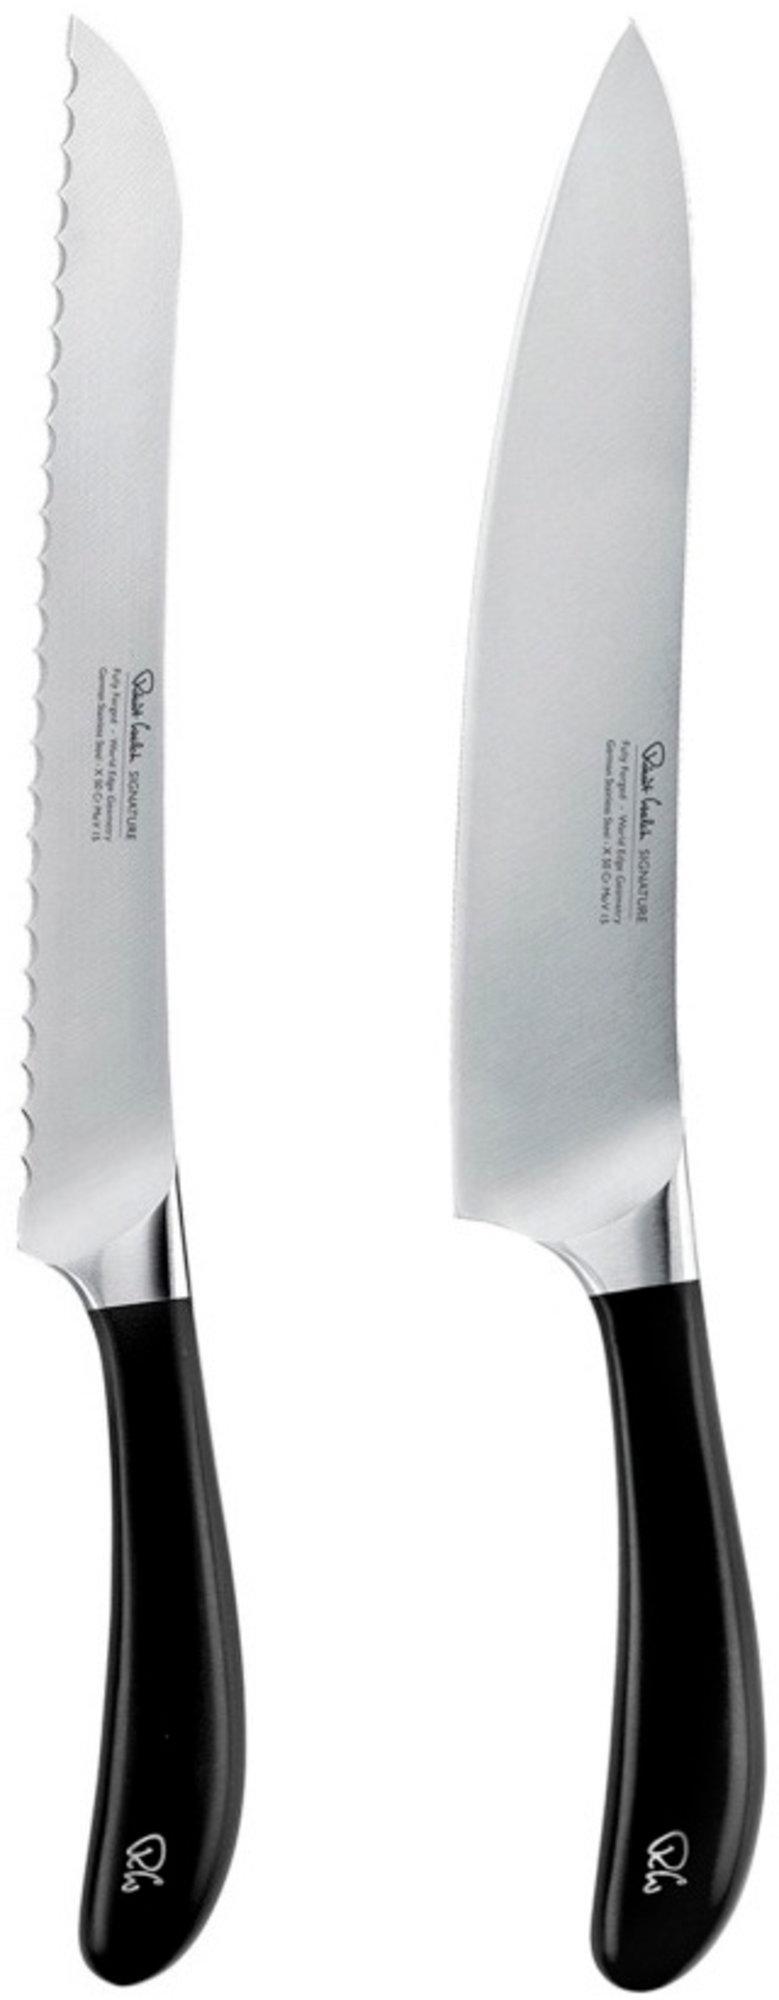 Robert Welch Signature Knivset Kock- & Brödkniv